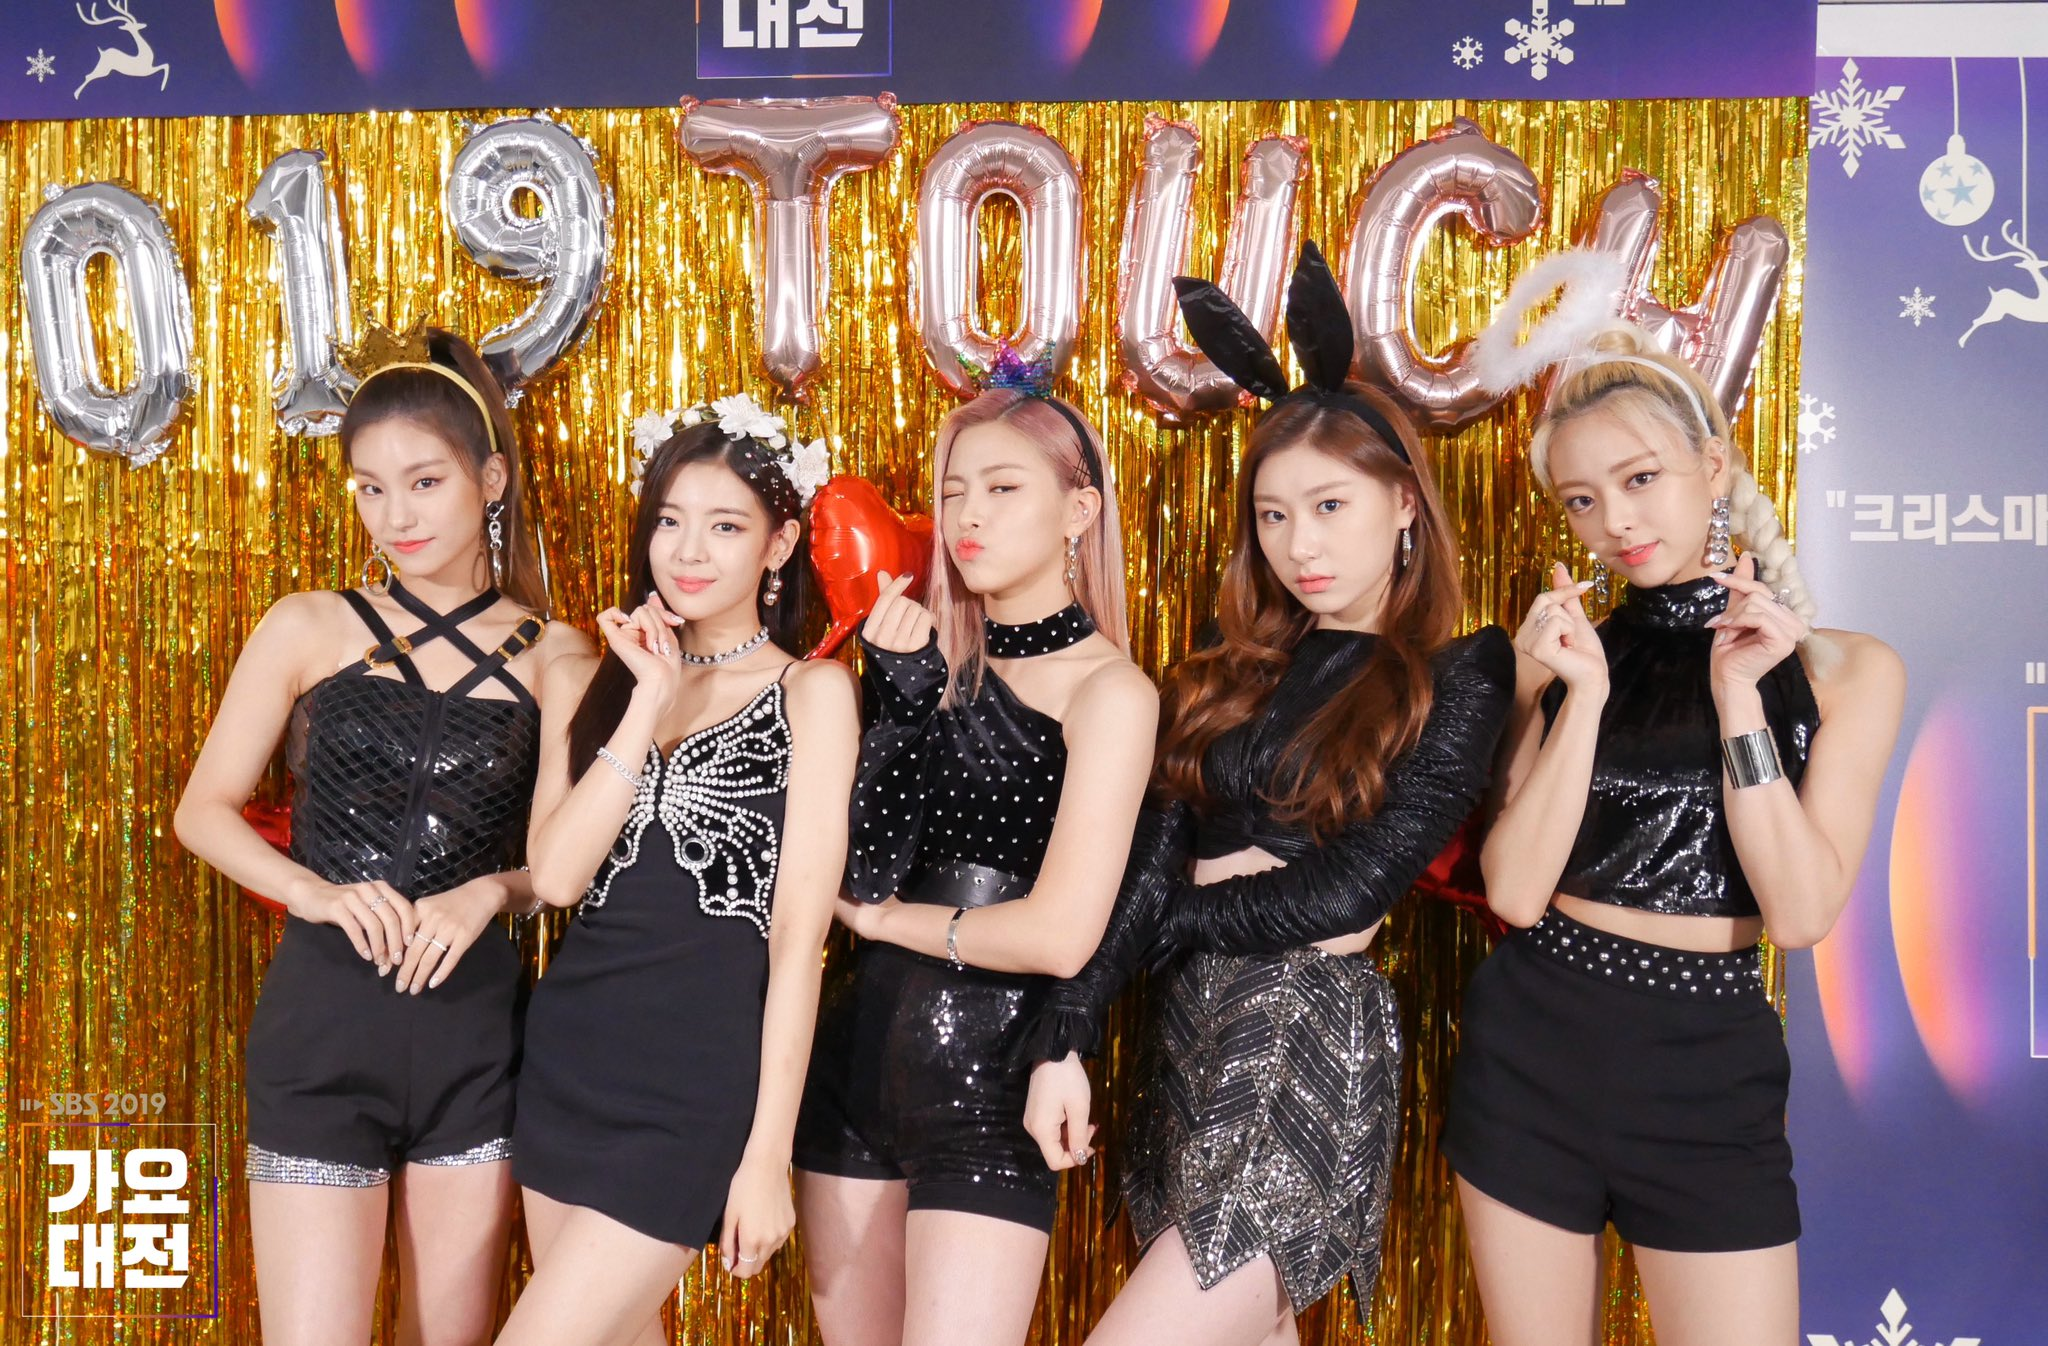 Stars Shine On The Red Carpet At 2019 SBS Gayo Daejeon | Soompi